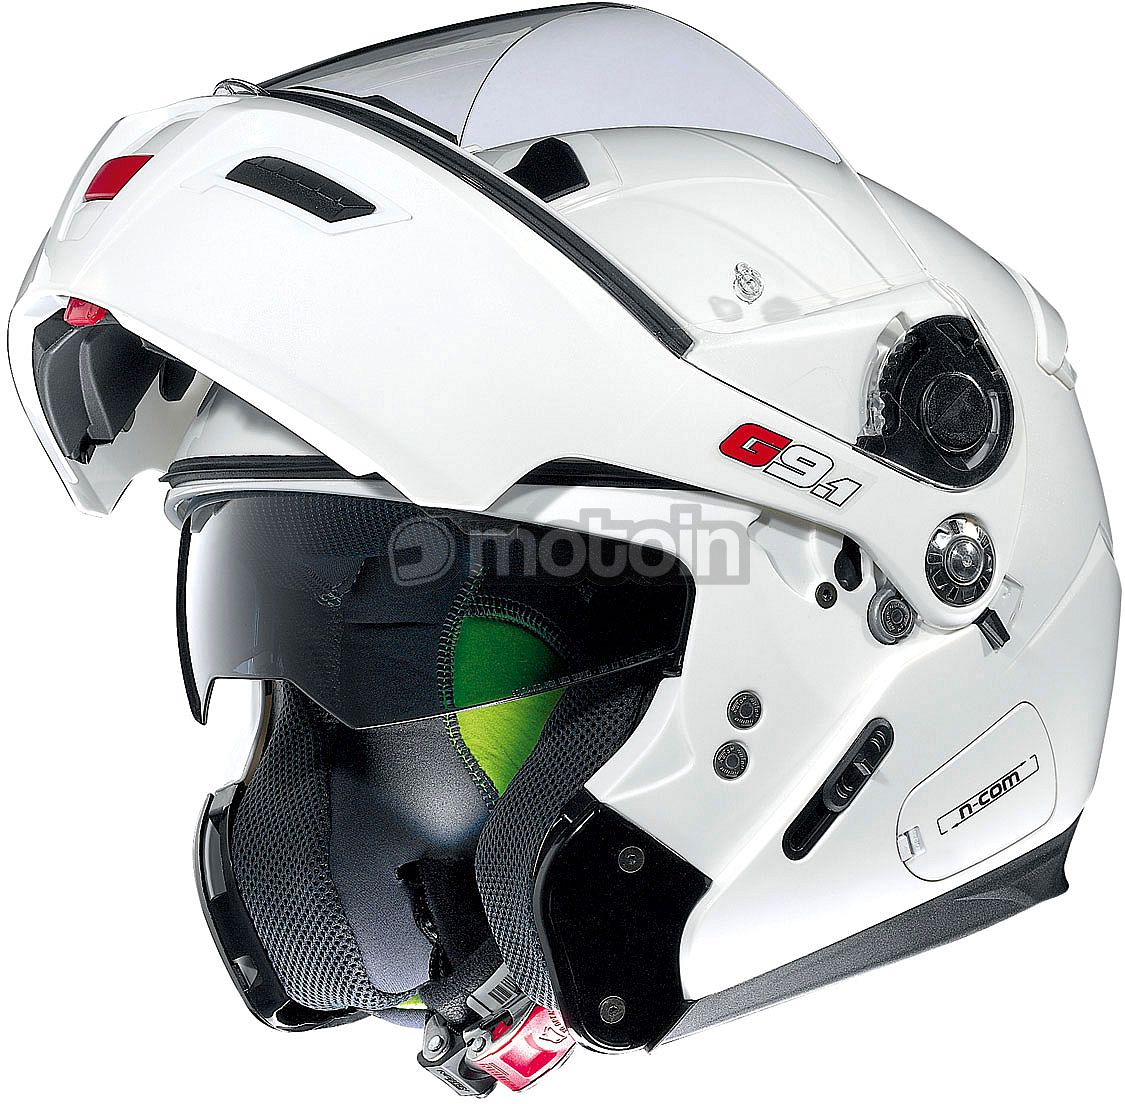 GREX CASCO MOTO MODULAR G9.1 EVOLVE KINETIC 023 XL